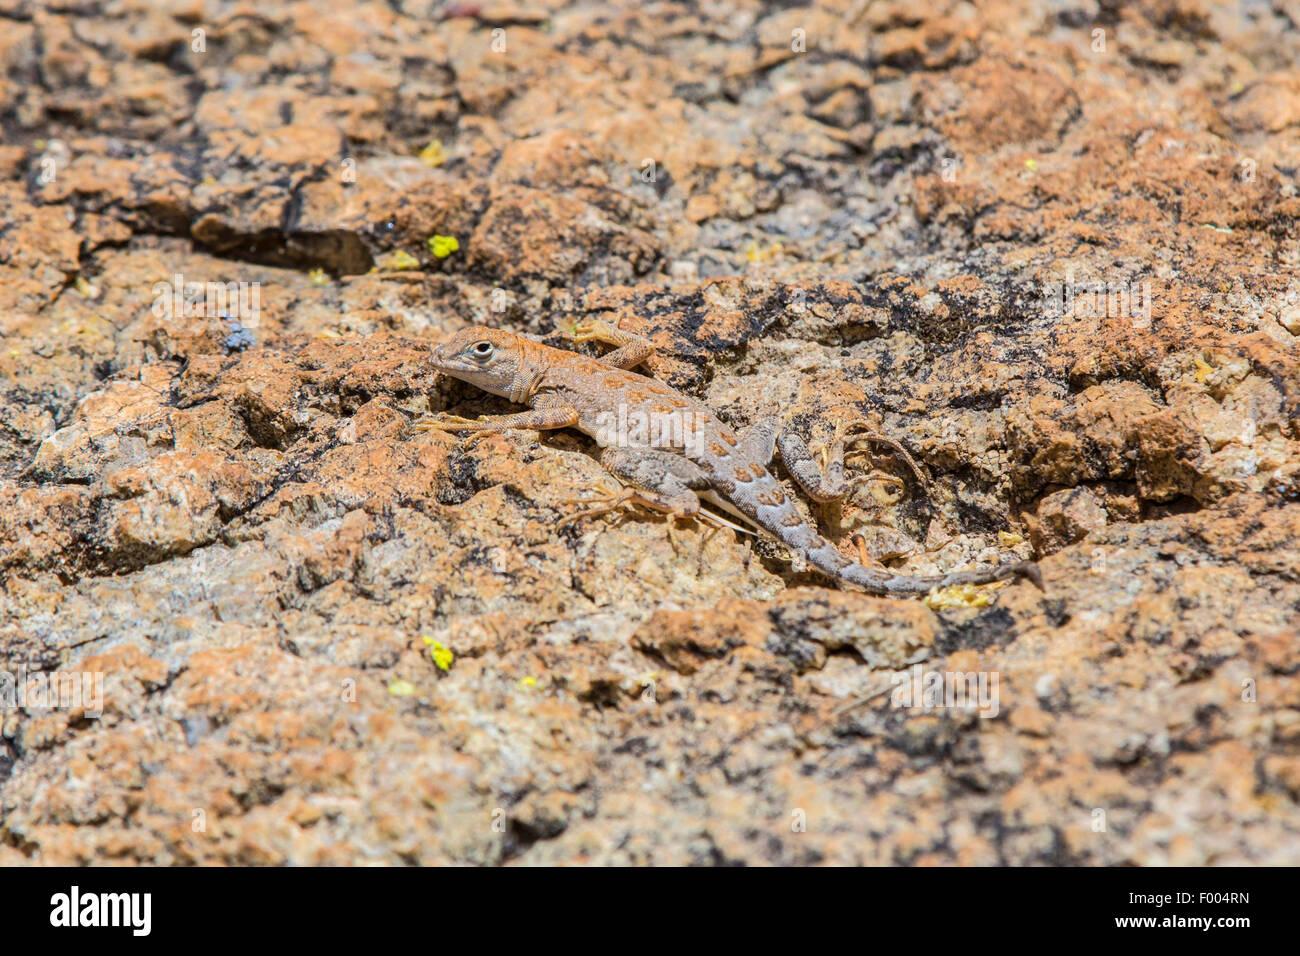 Elegante Earless Lizard (vgl. Holbrookia Elegans), gut getarnt auf Felsen, USA, Arizona Stockbild